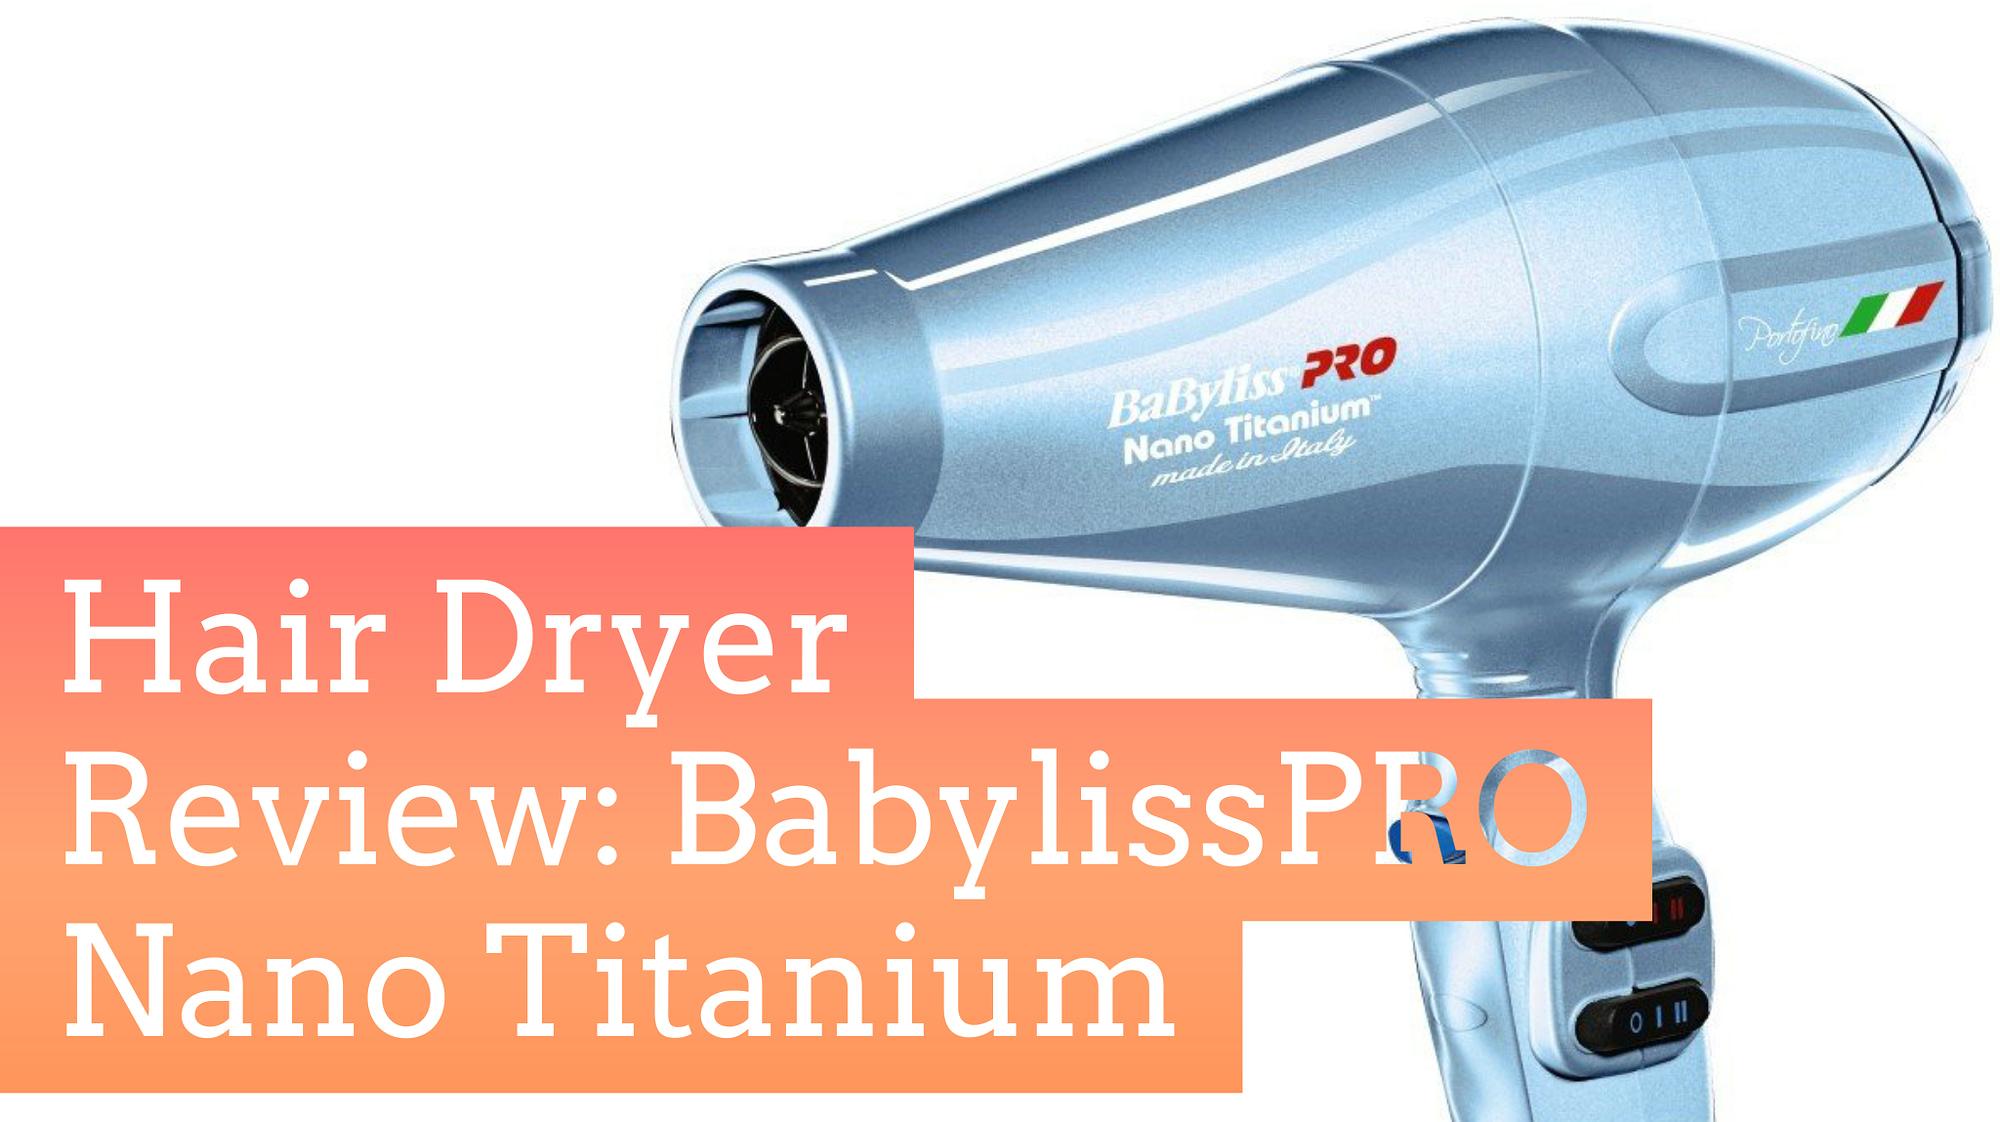 BabylissPro Nano Titanum Hair Dryer Review